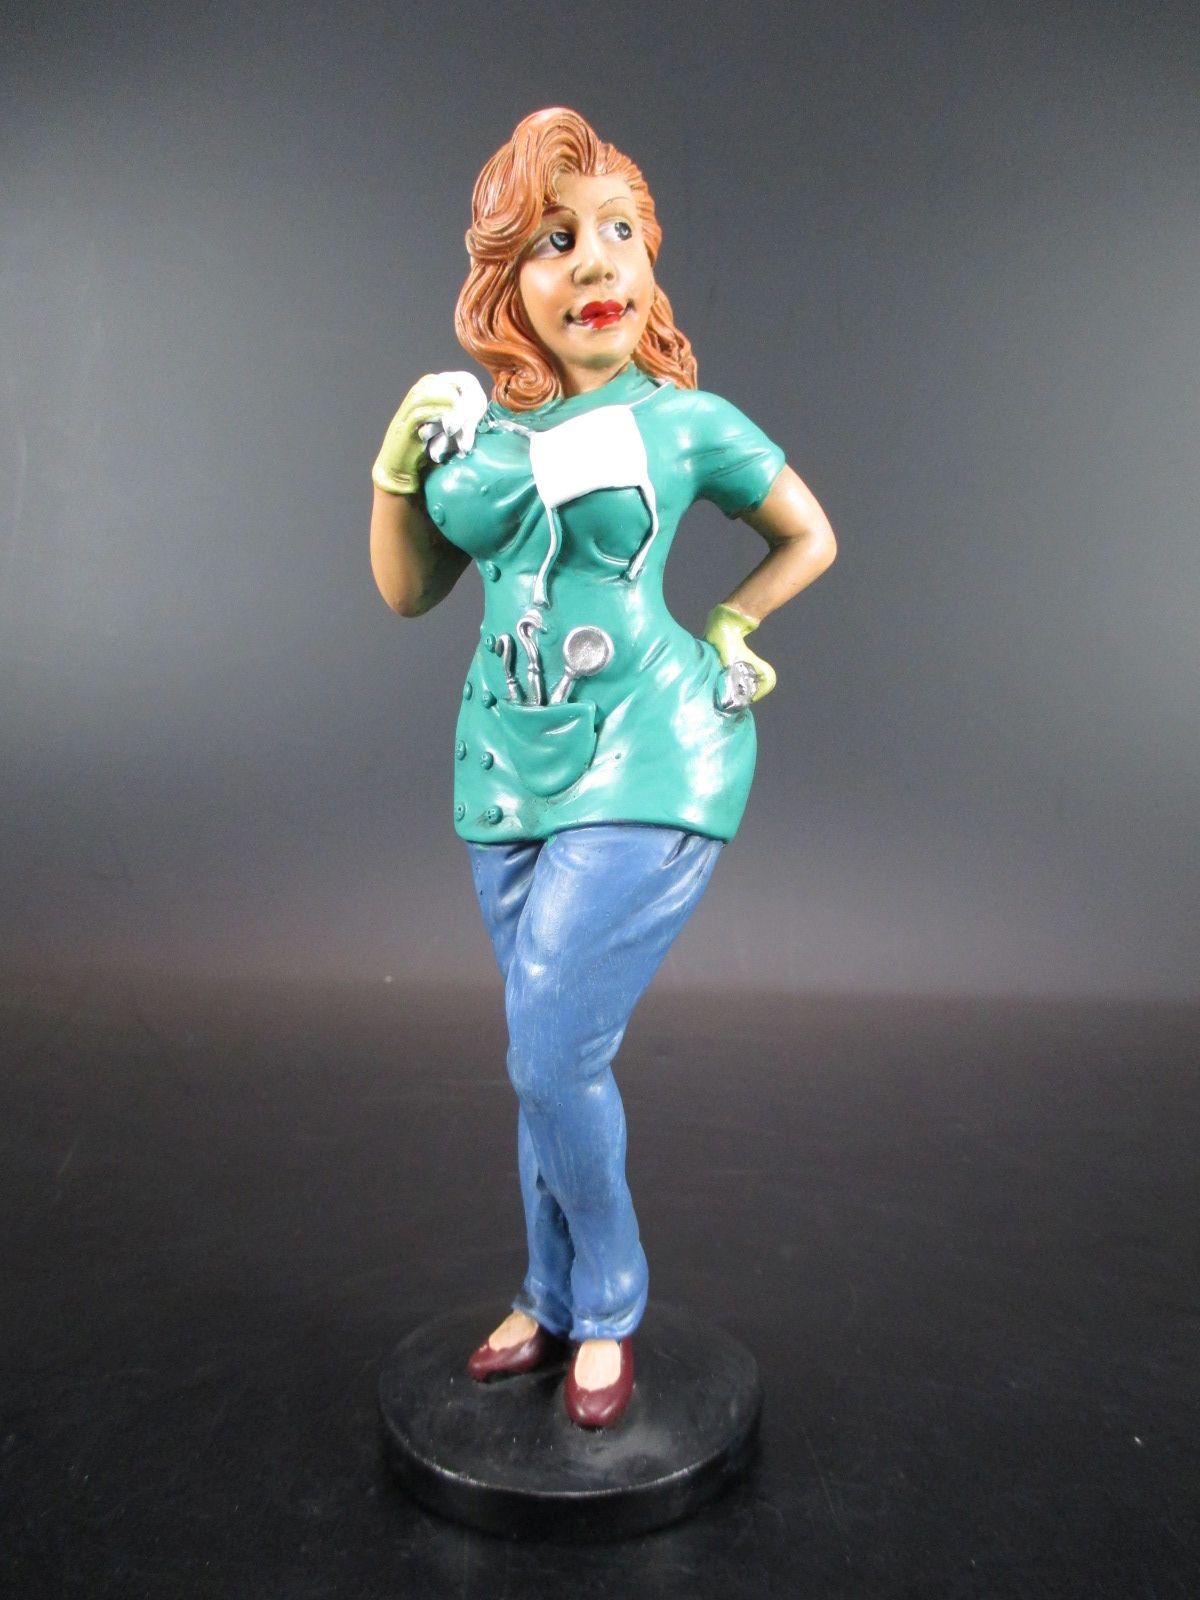 y Krankenschwester Nurse Funny Job Beruf Figur Profession 16 cm